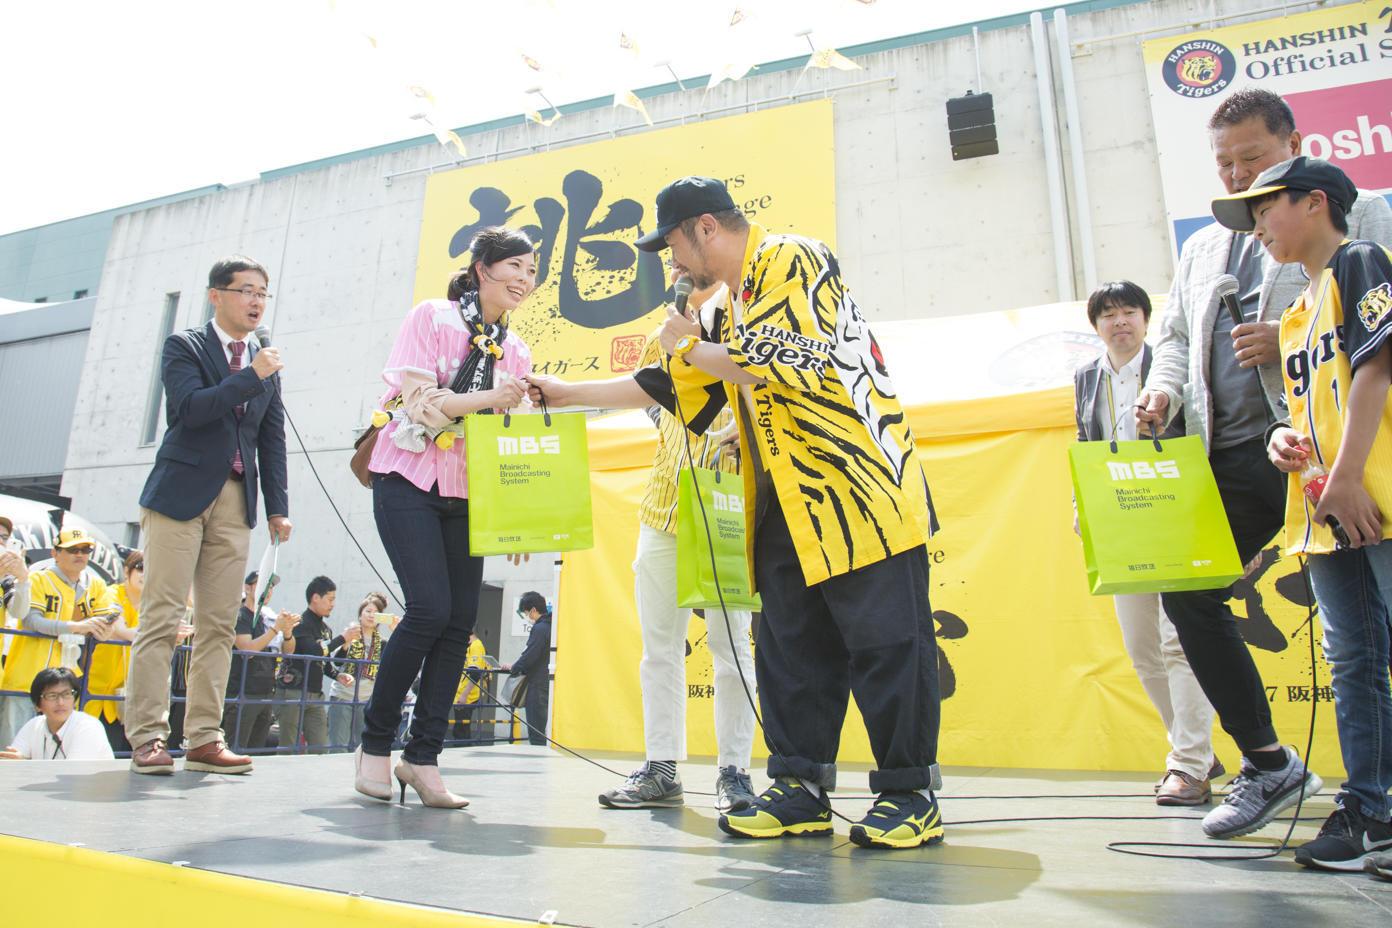 http://news.yoshimoto.co.jp/20170430092539-603f6bebc6070f1c0bedecdfd5d862bbbe720c93.jpg